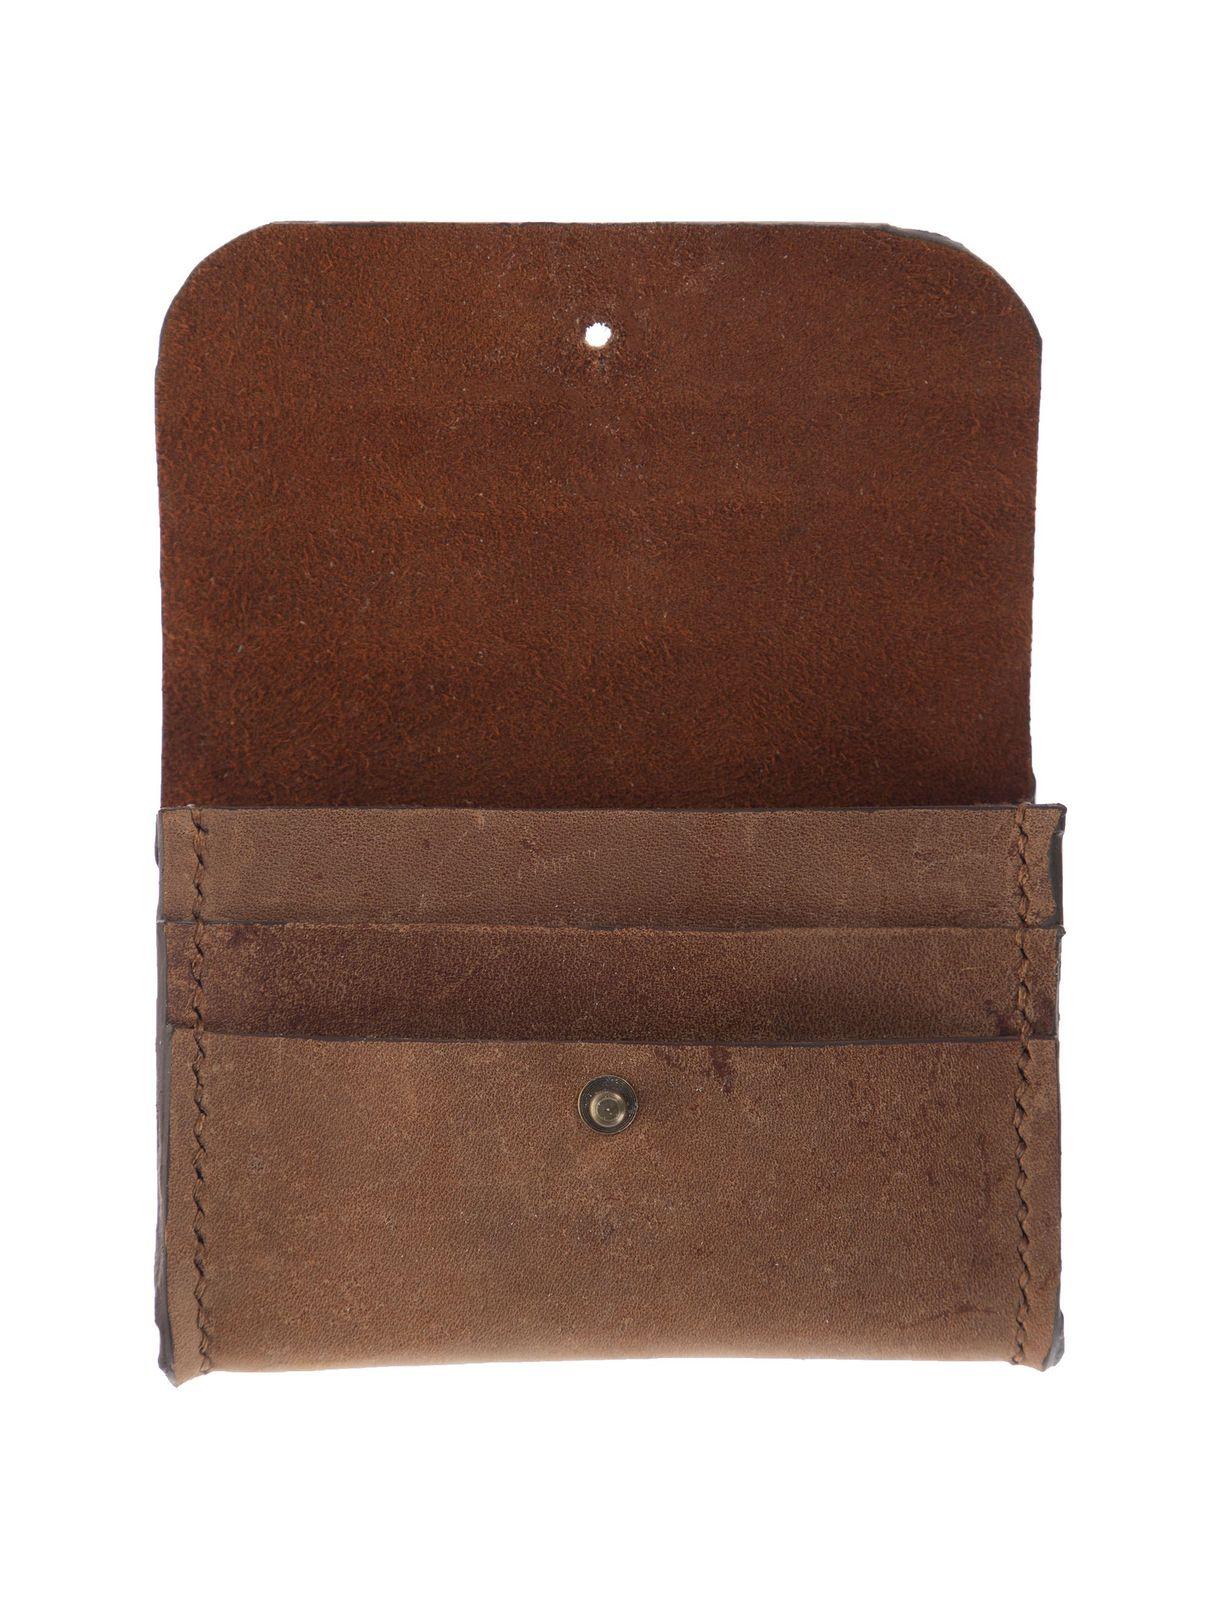 کیف کارت اعتباری چرم بزرگسال - چرم لانکا تک سایز main 1 3